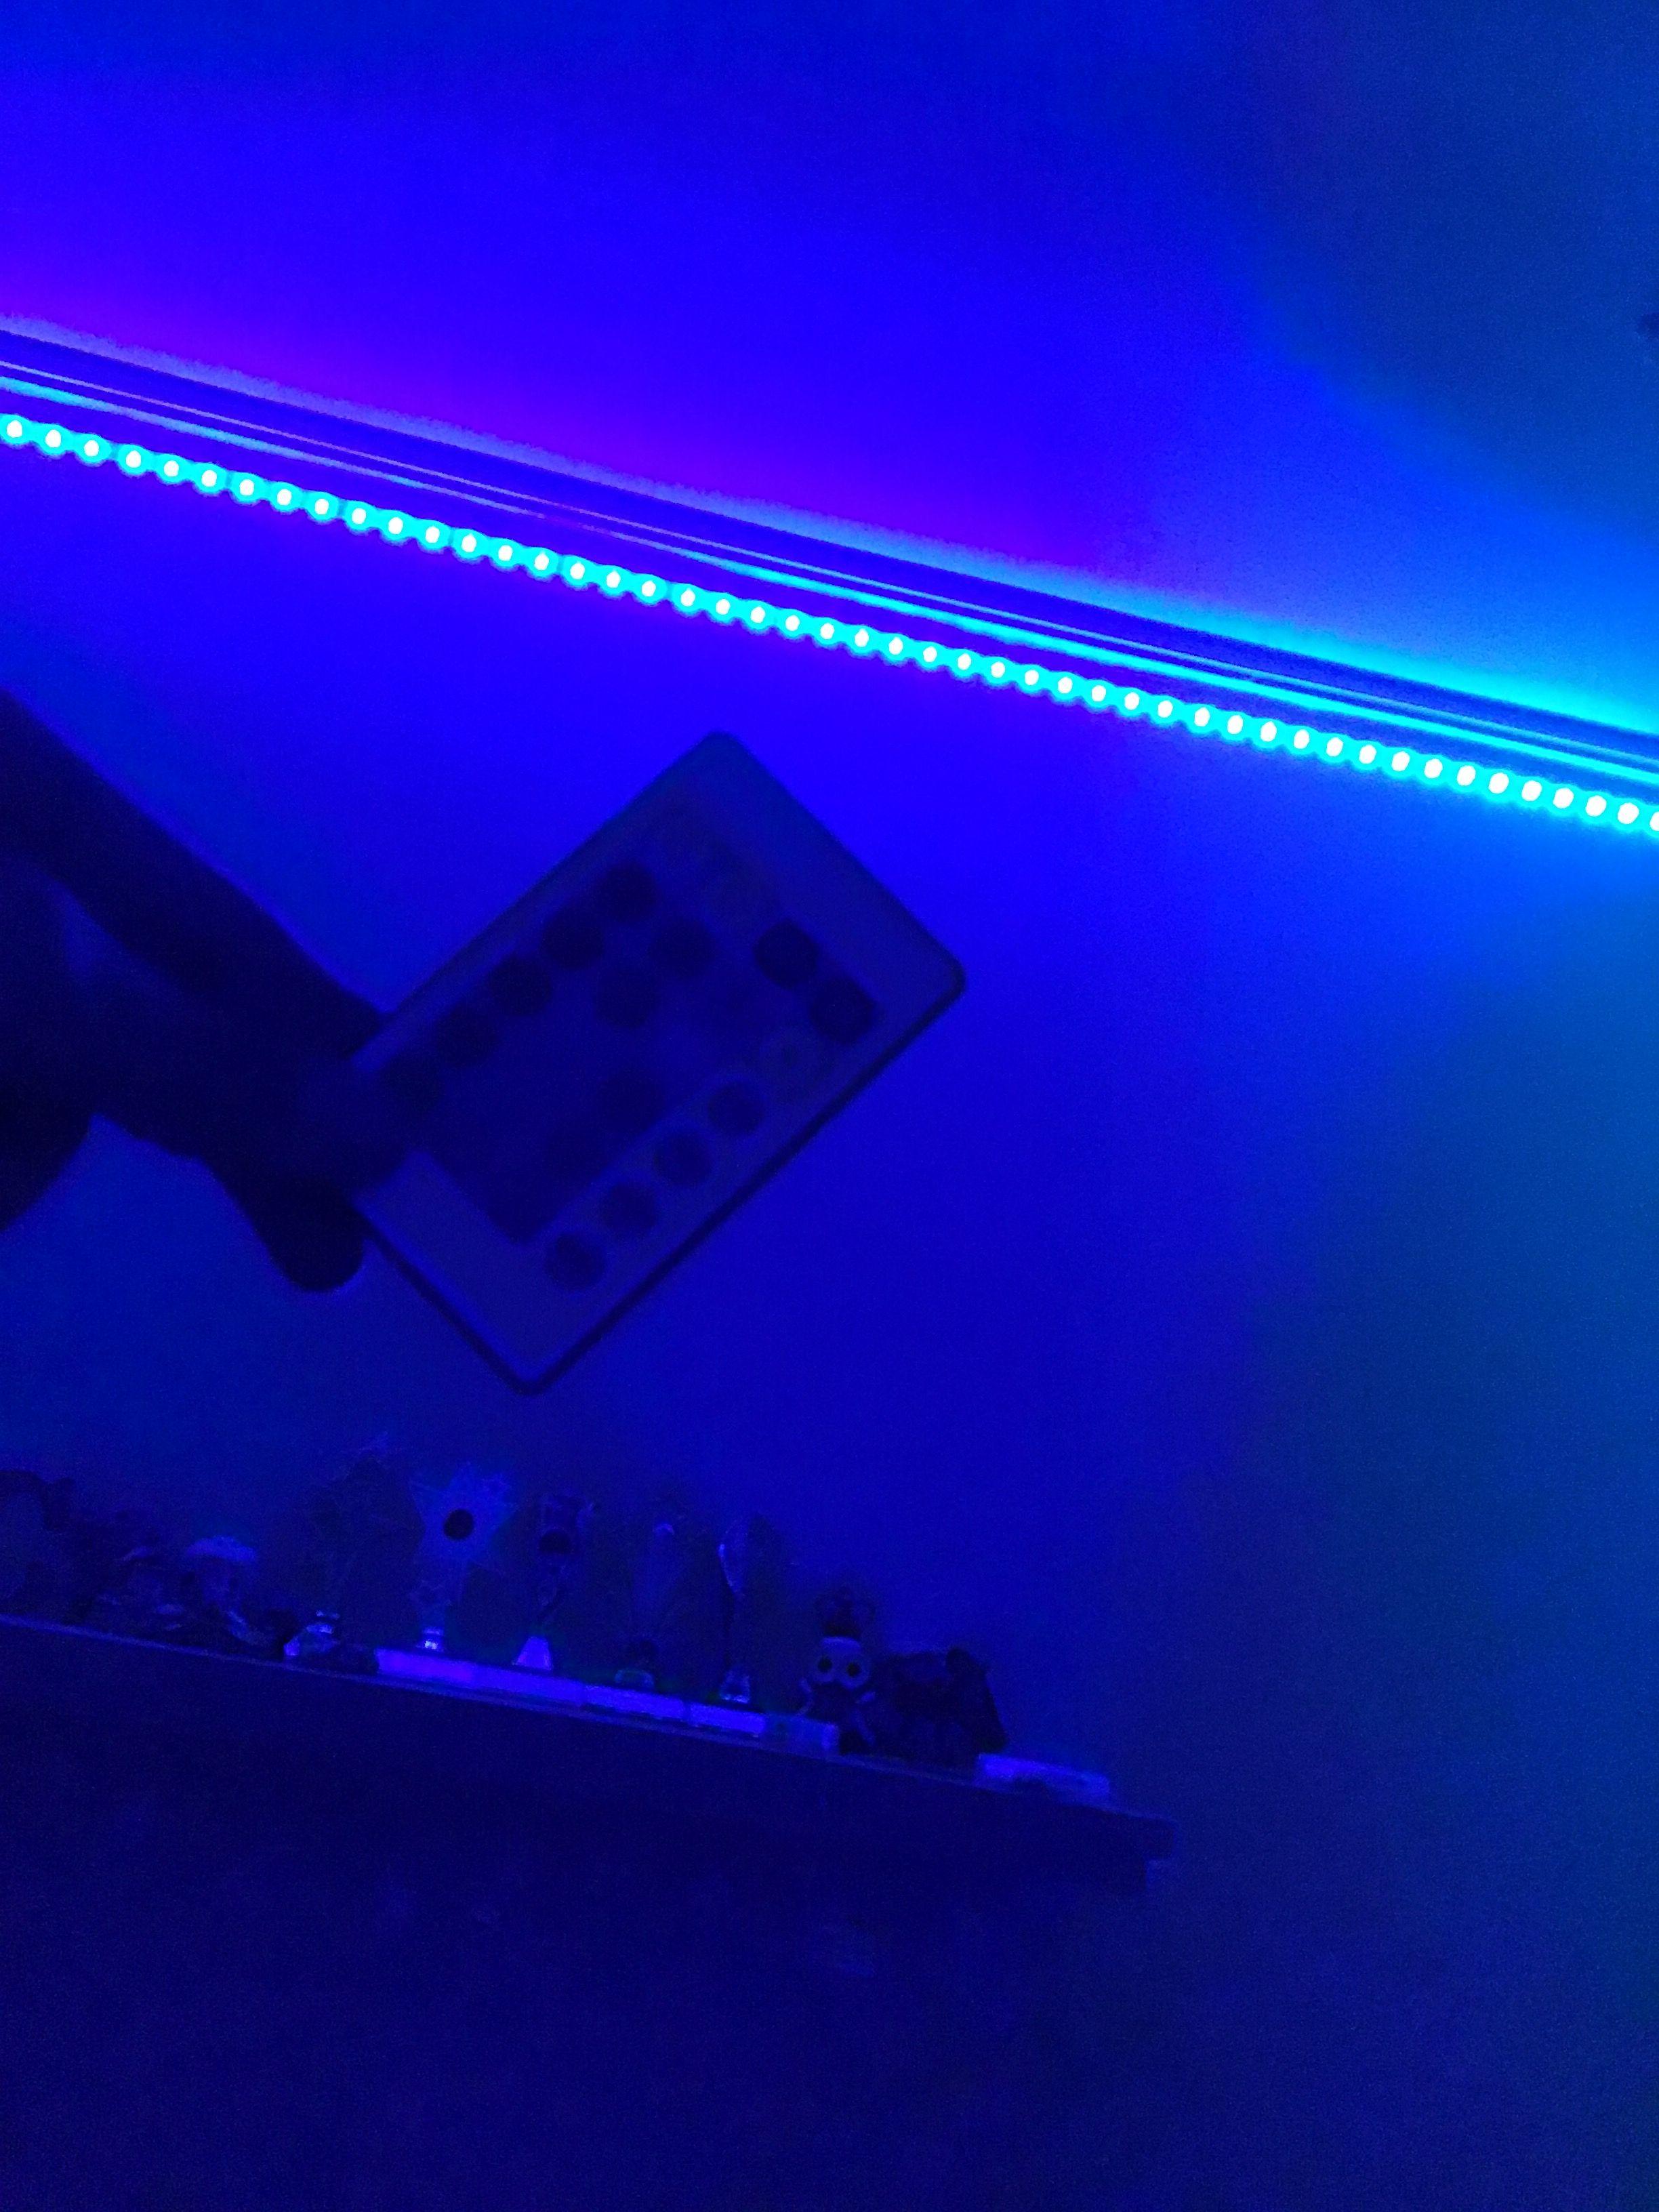 Lytworx Rgb Colour Changing Led Strip Light With Sound Sync In 2020 Led Strip Lighting Strip Lighting Led Strip